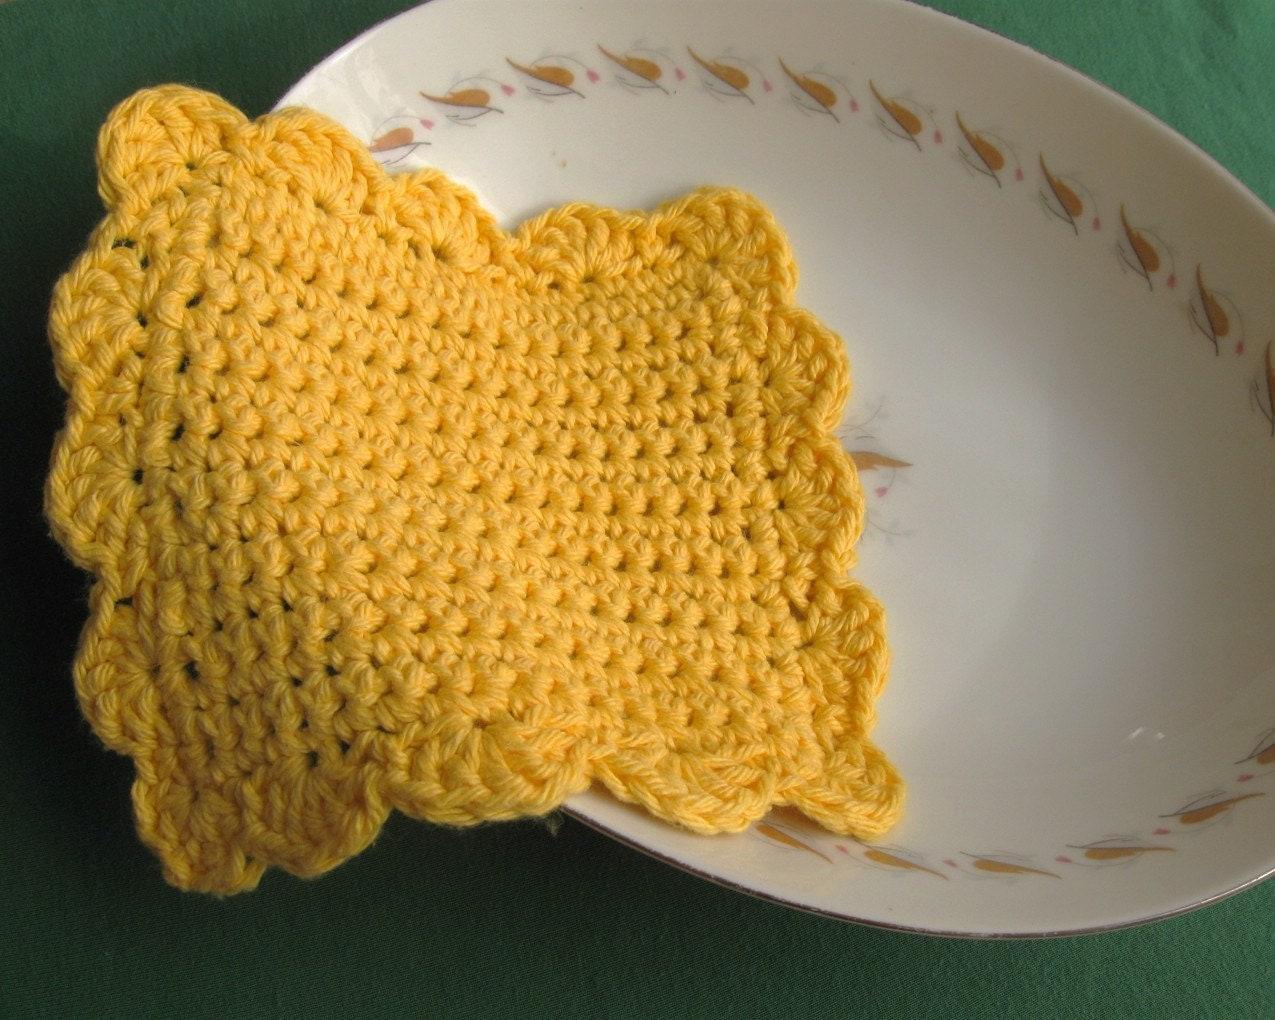 Crochet Dish Rags Patterns Crochet Patterns